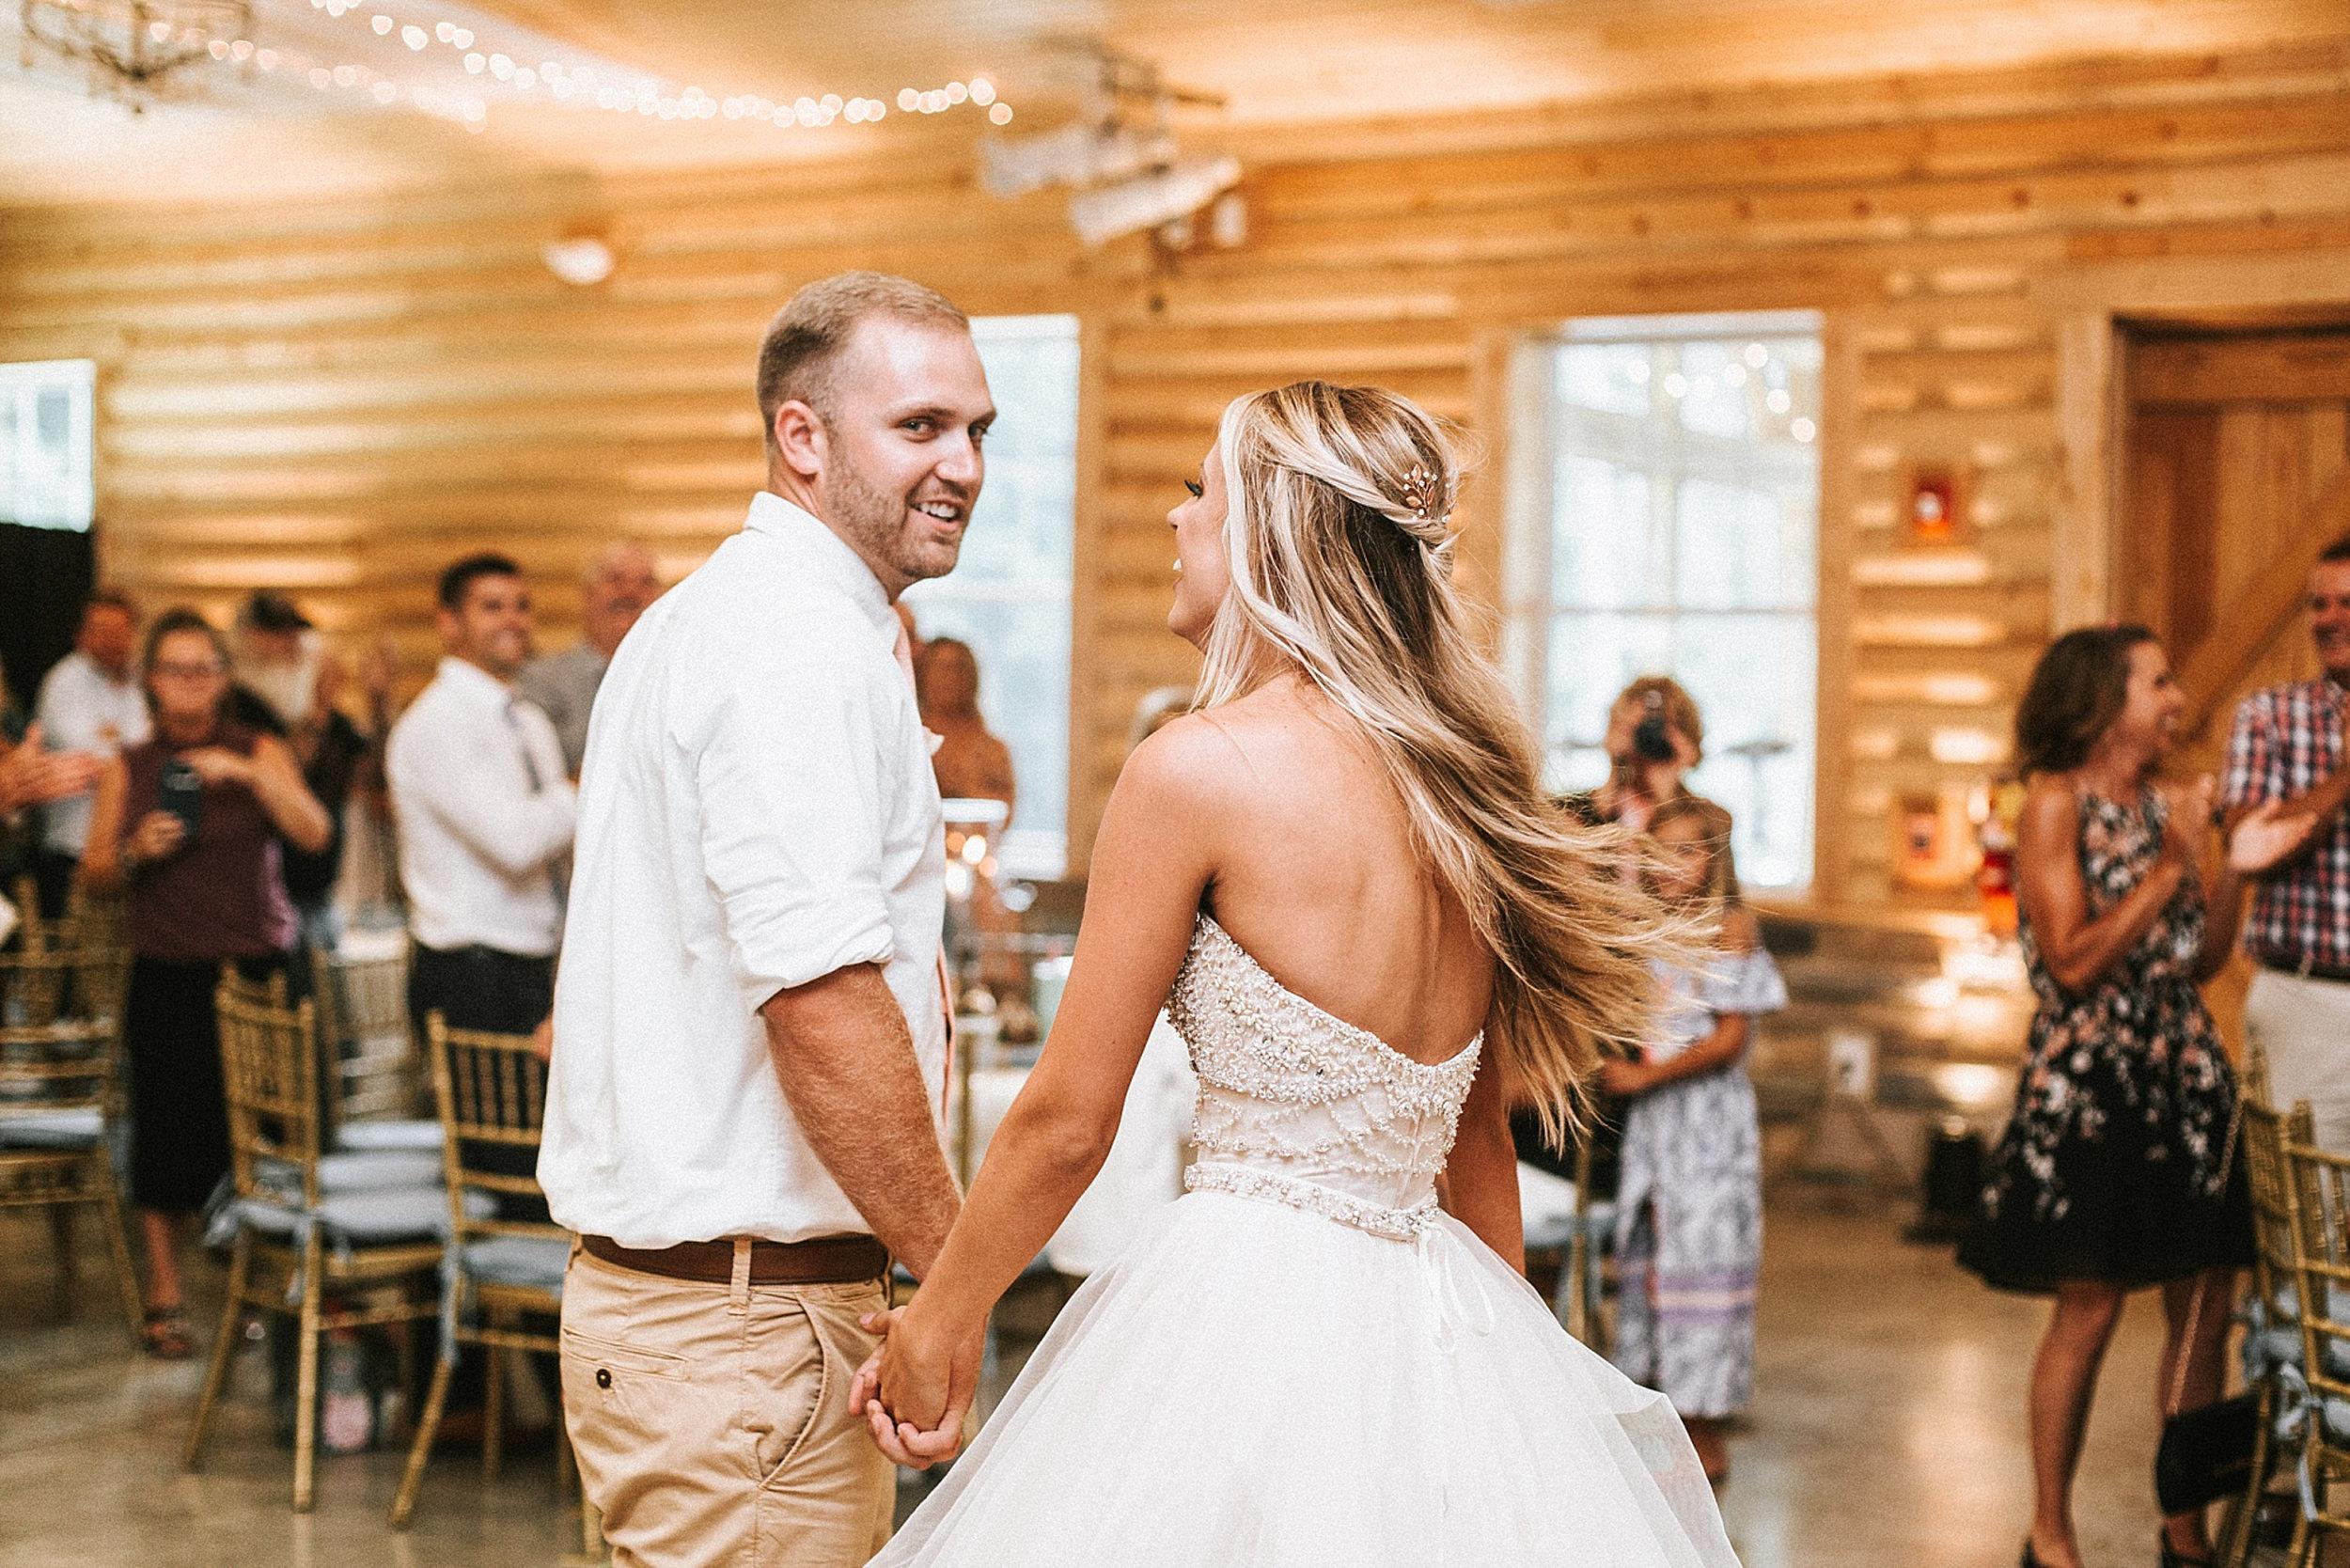 Brooke Townsend Photography - Cincinnati Wedding Photographer (128 of 153).jpg